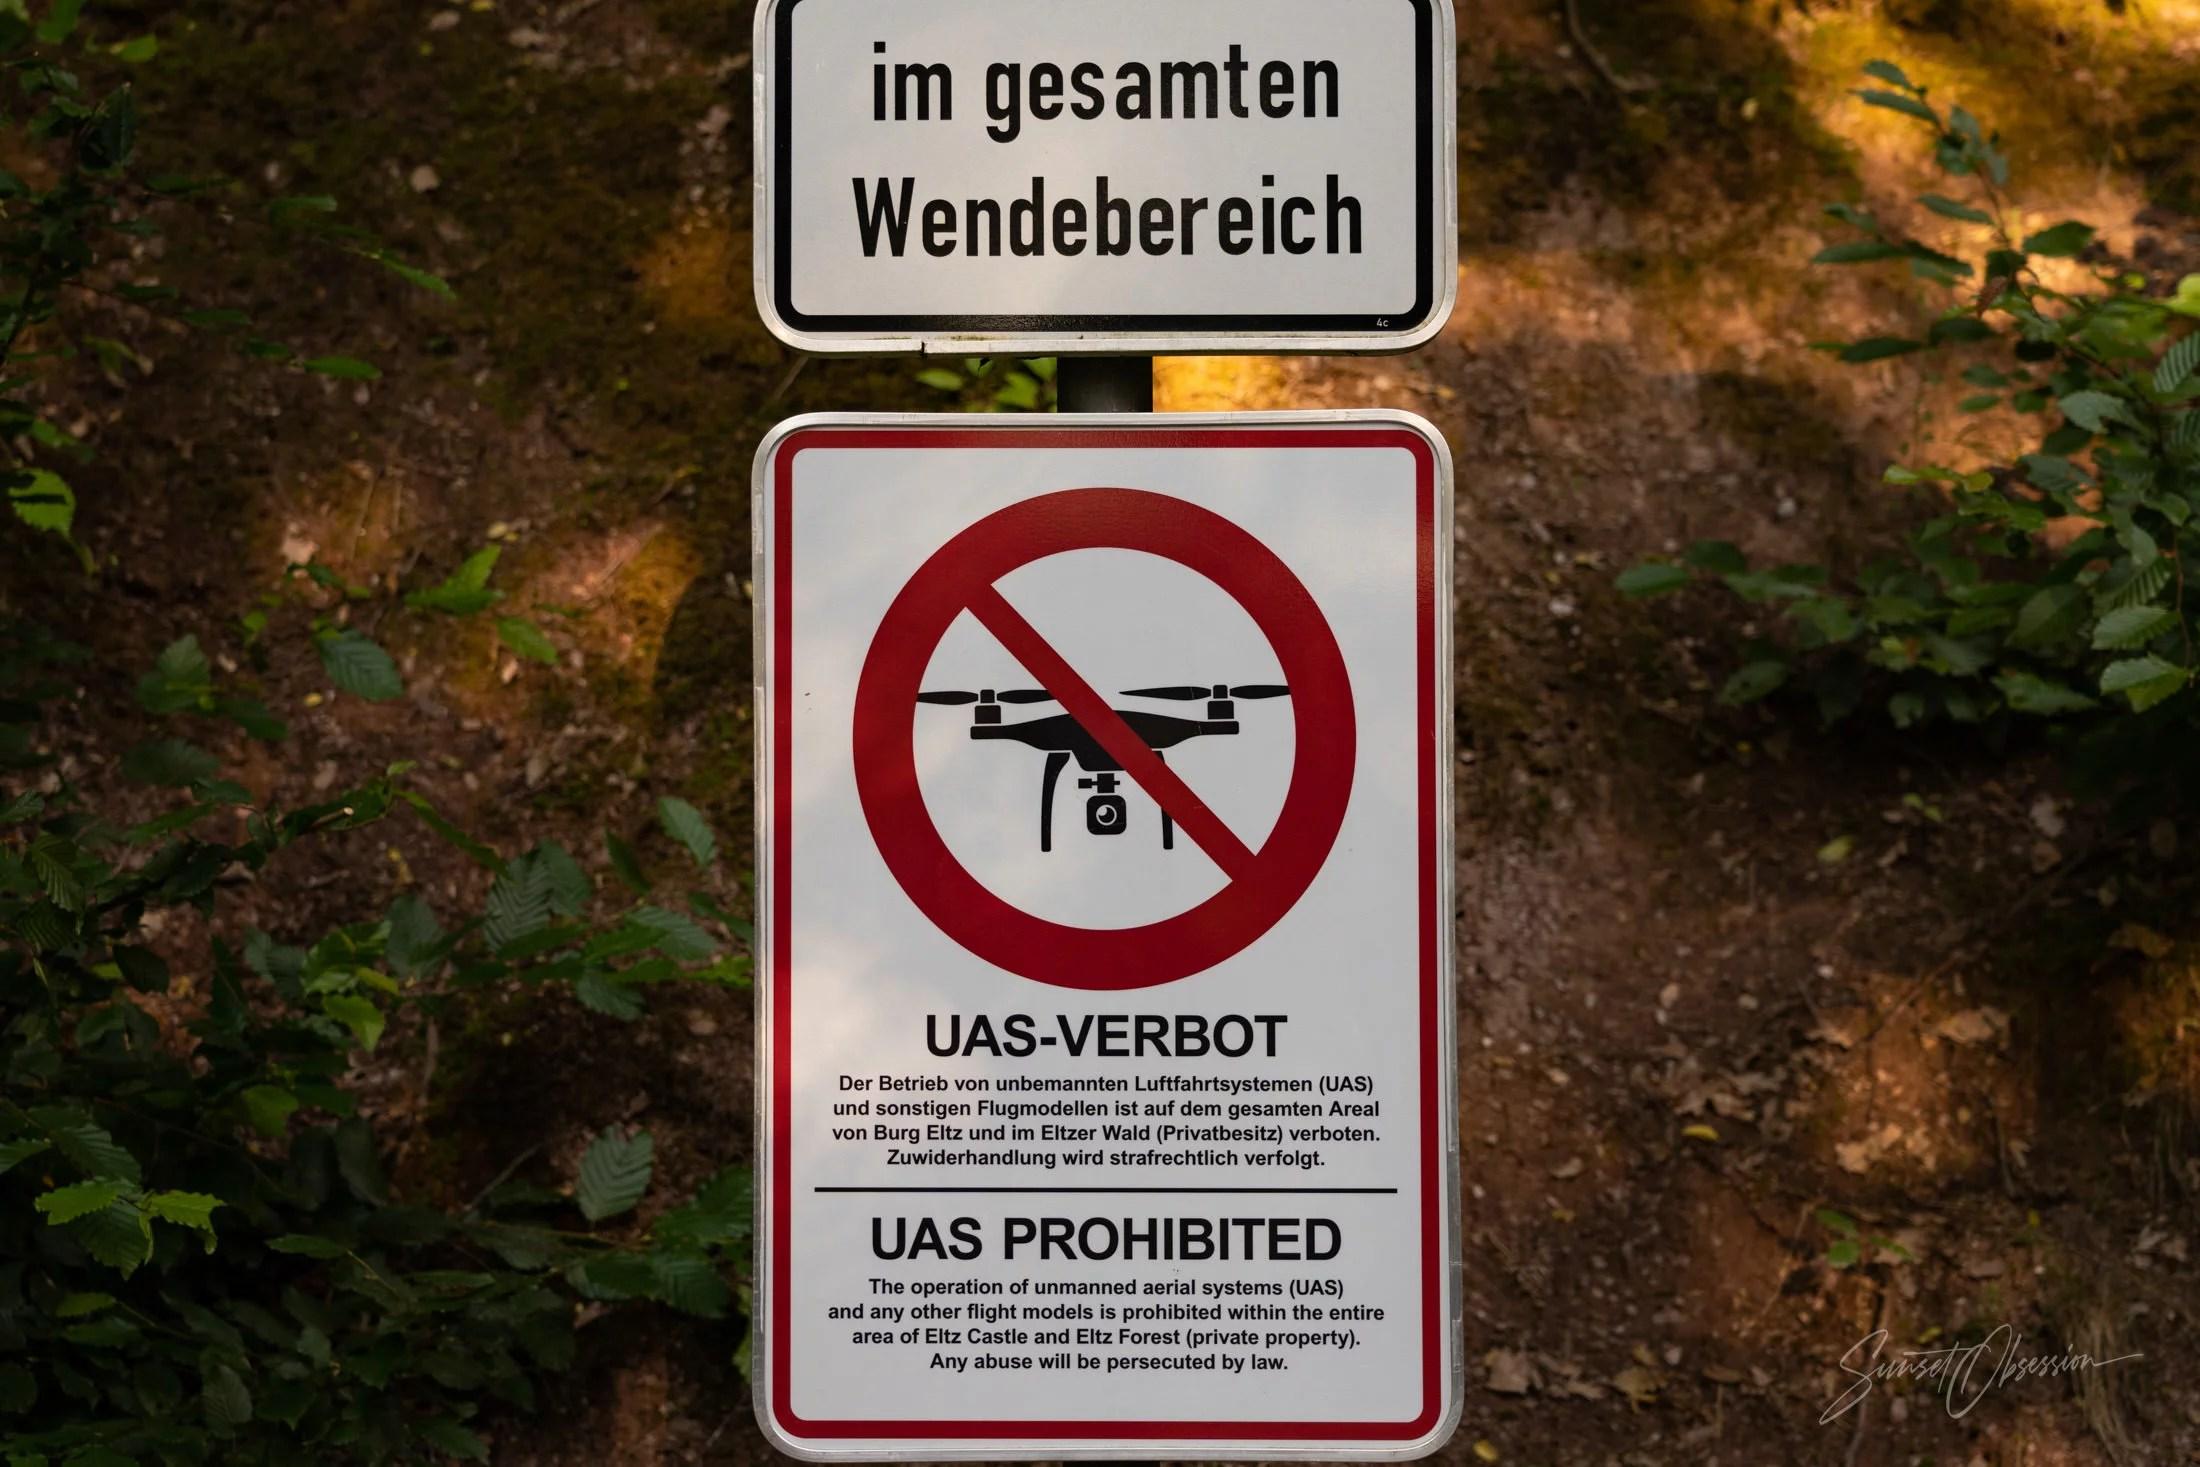 No drones allowed sign near Burg Eltz